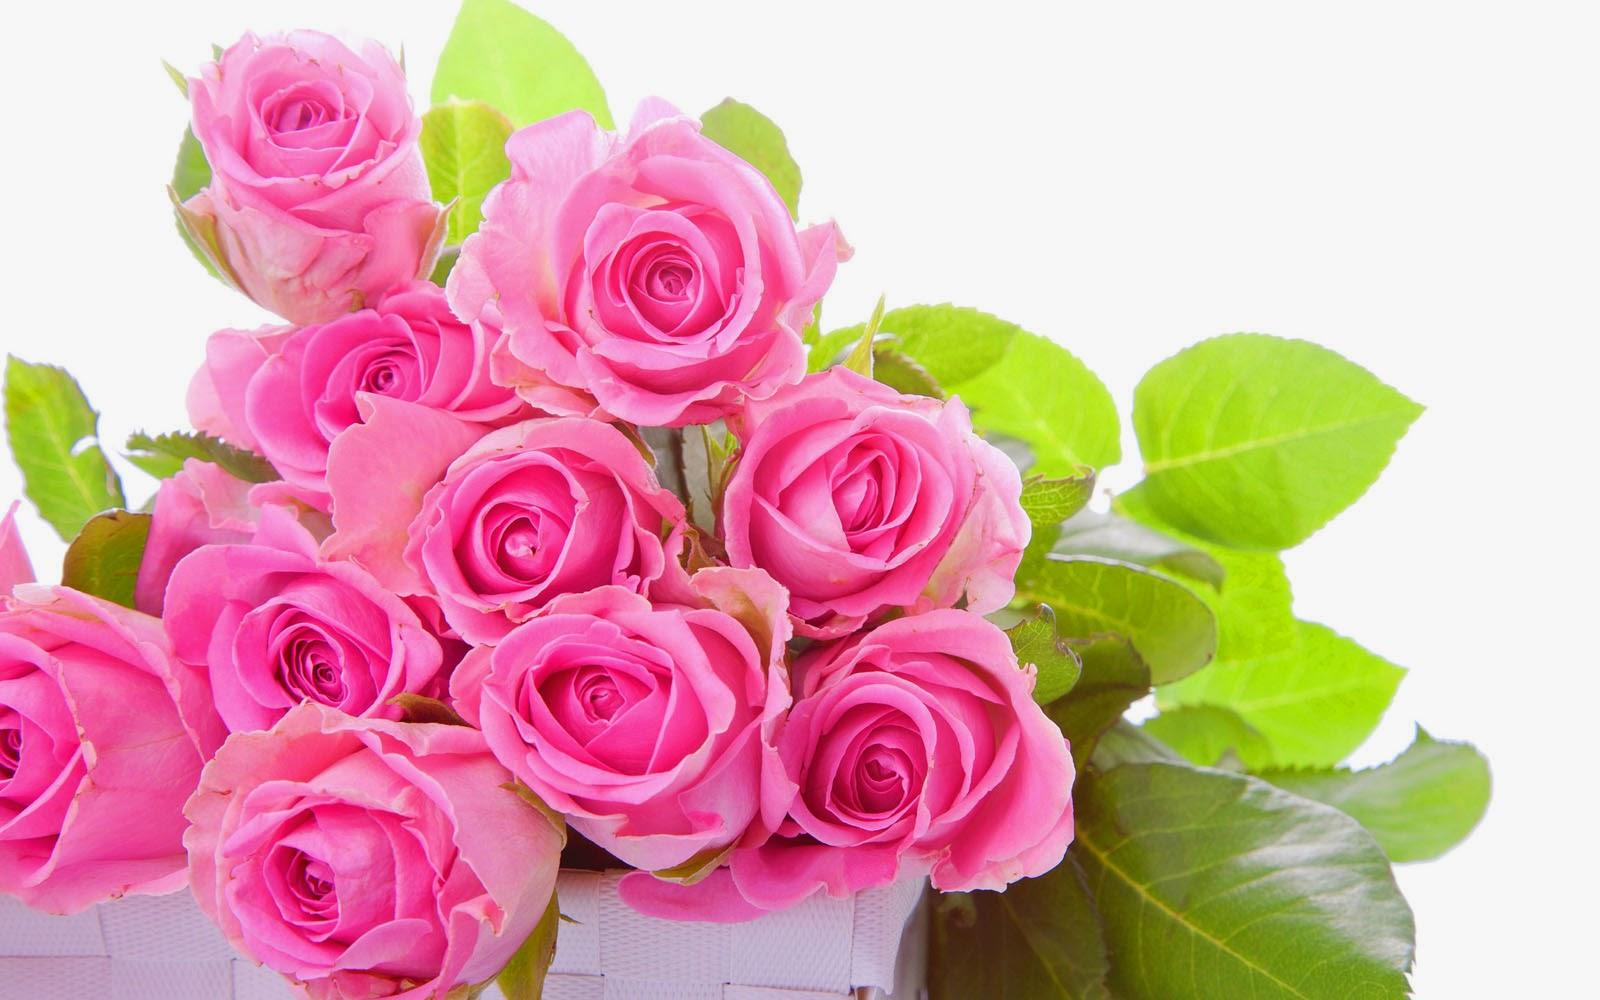 desktop wallpapers pink rose bouquet desktop backgrounds pink rose 1600x1000